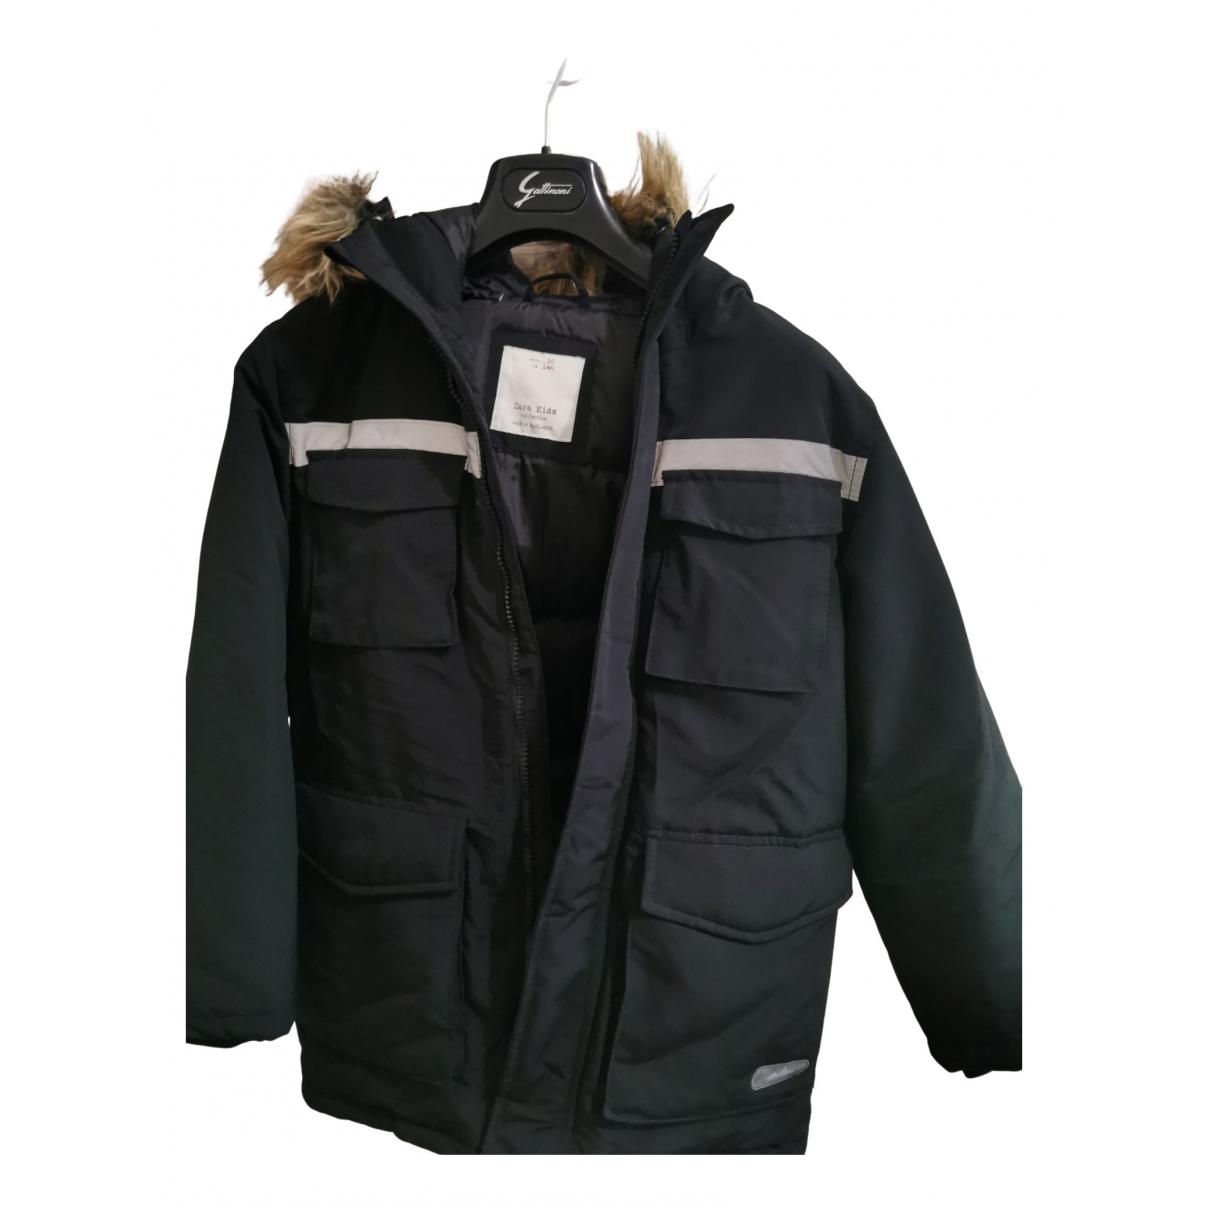 Zara \N Jacke, Maentel in  Schwarz Polyester